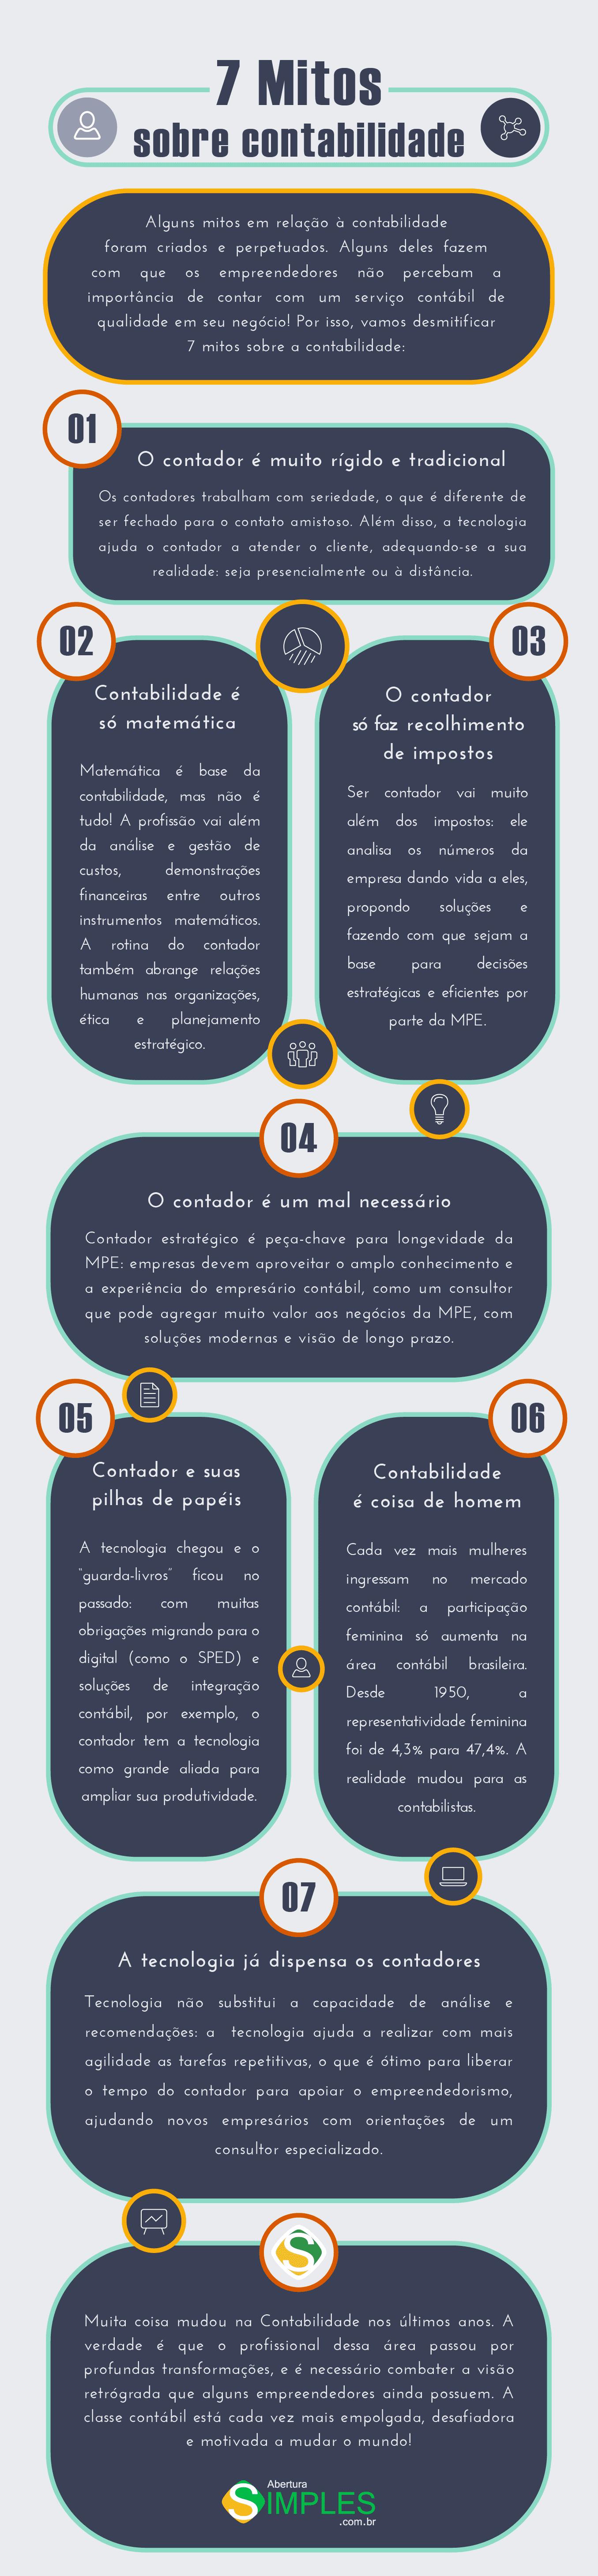 infográfico de mitos sobre contabilidade